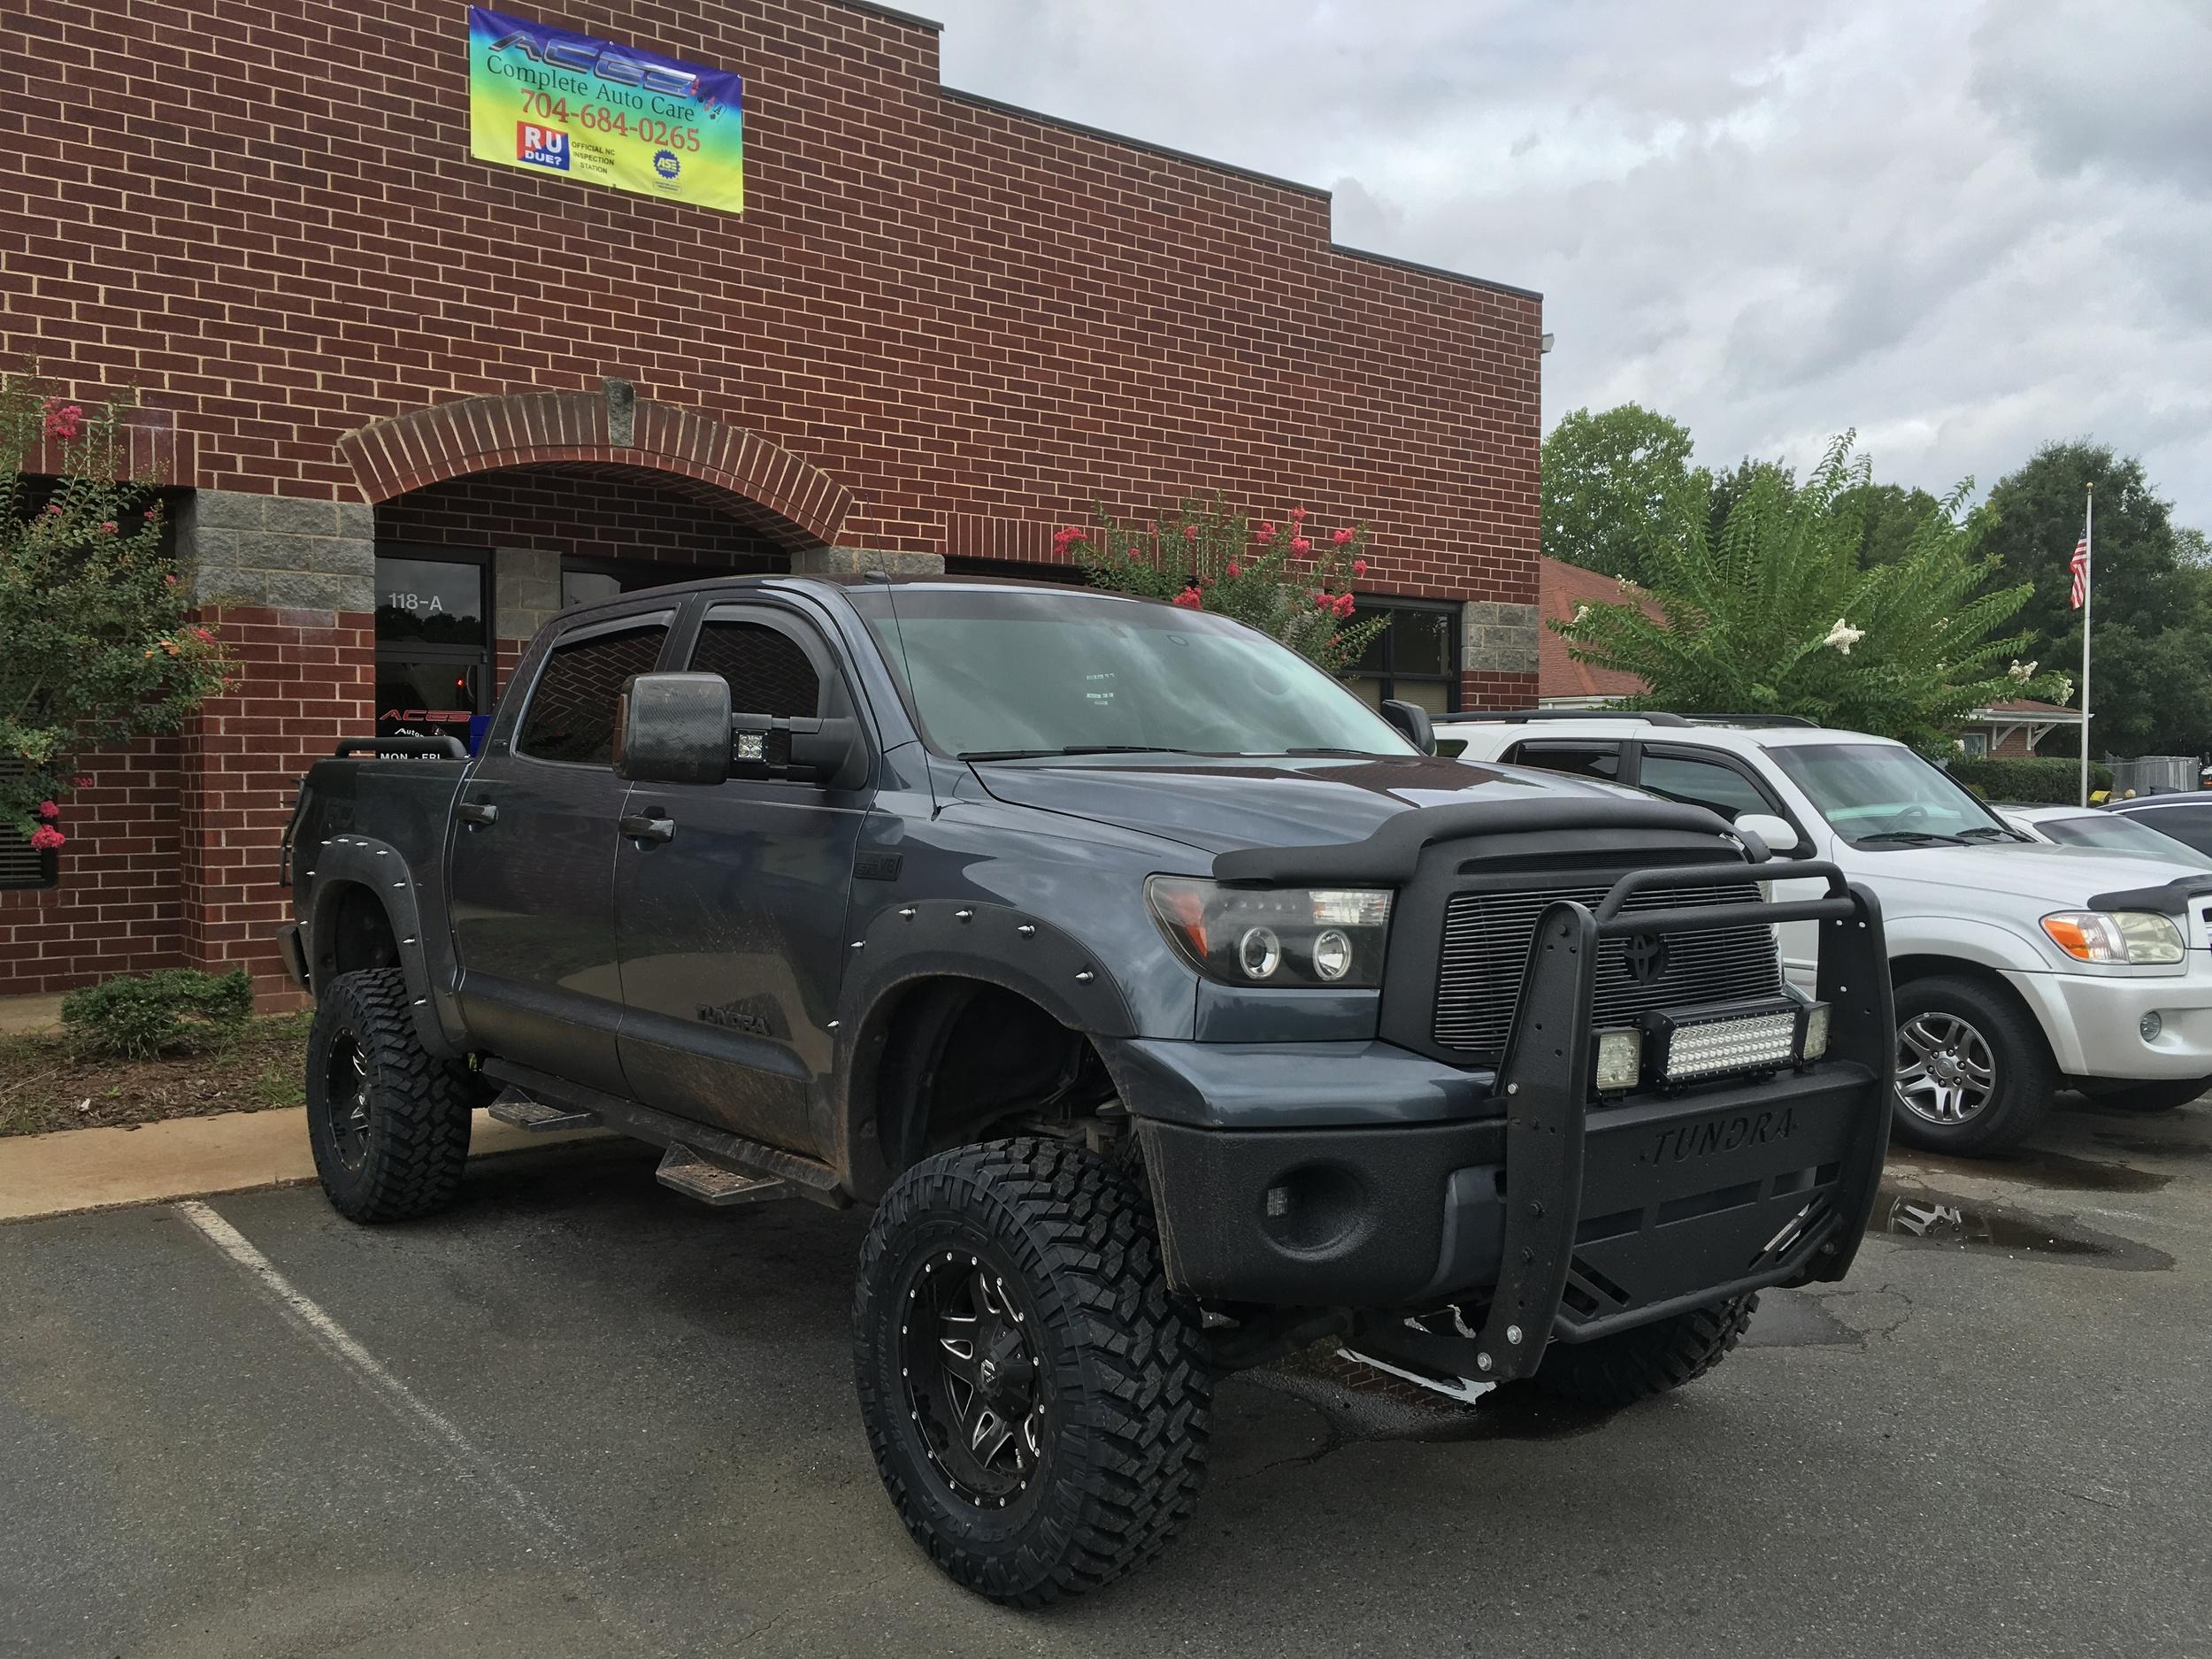 Toyota truck repair in Indian Trail, NC